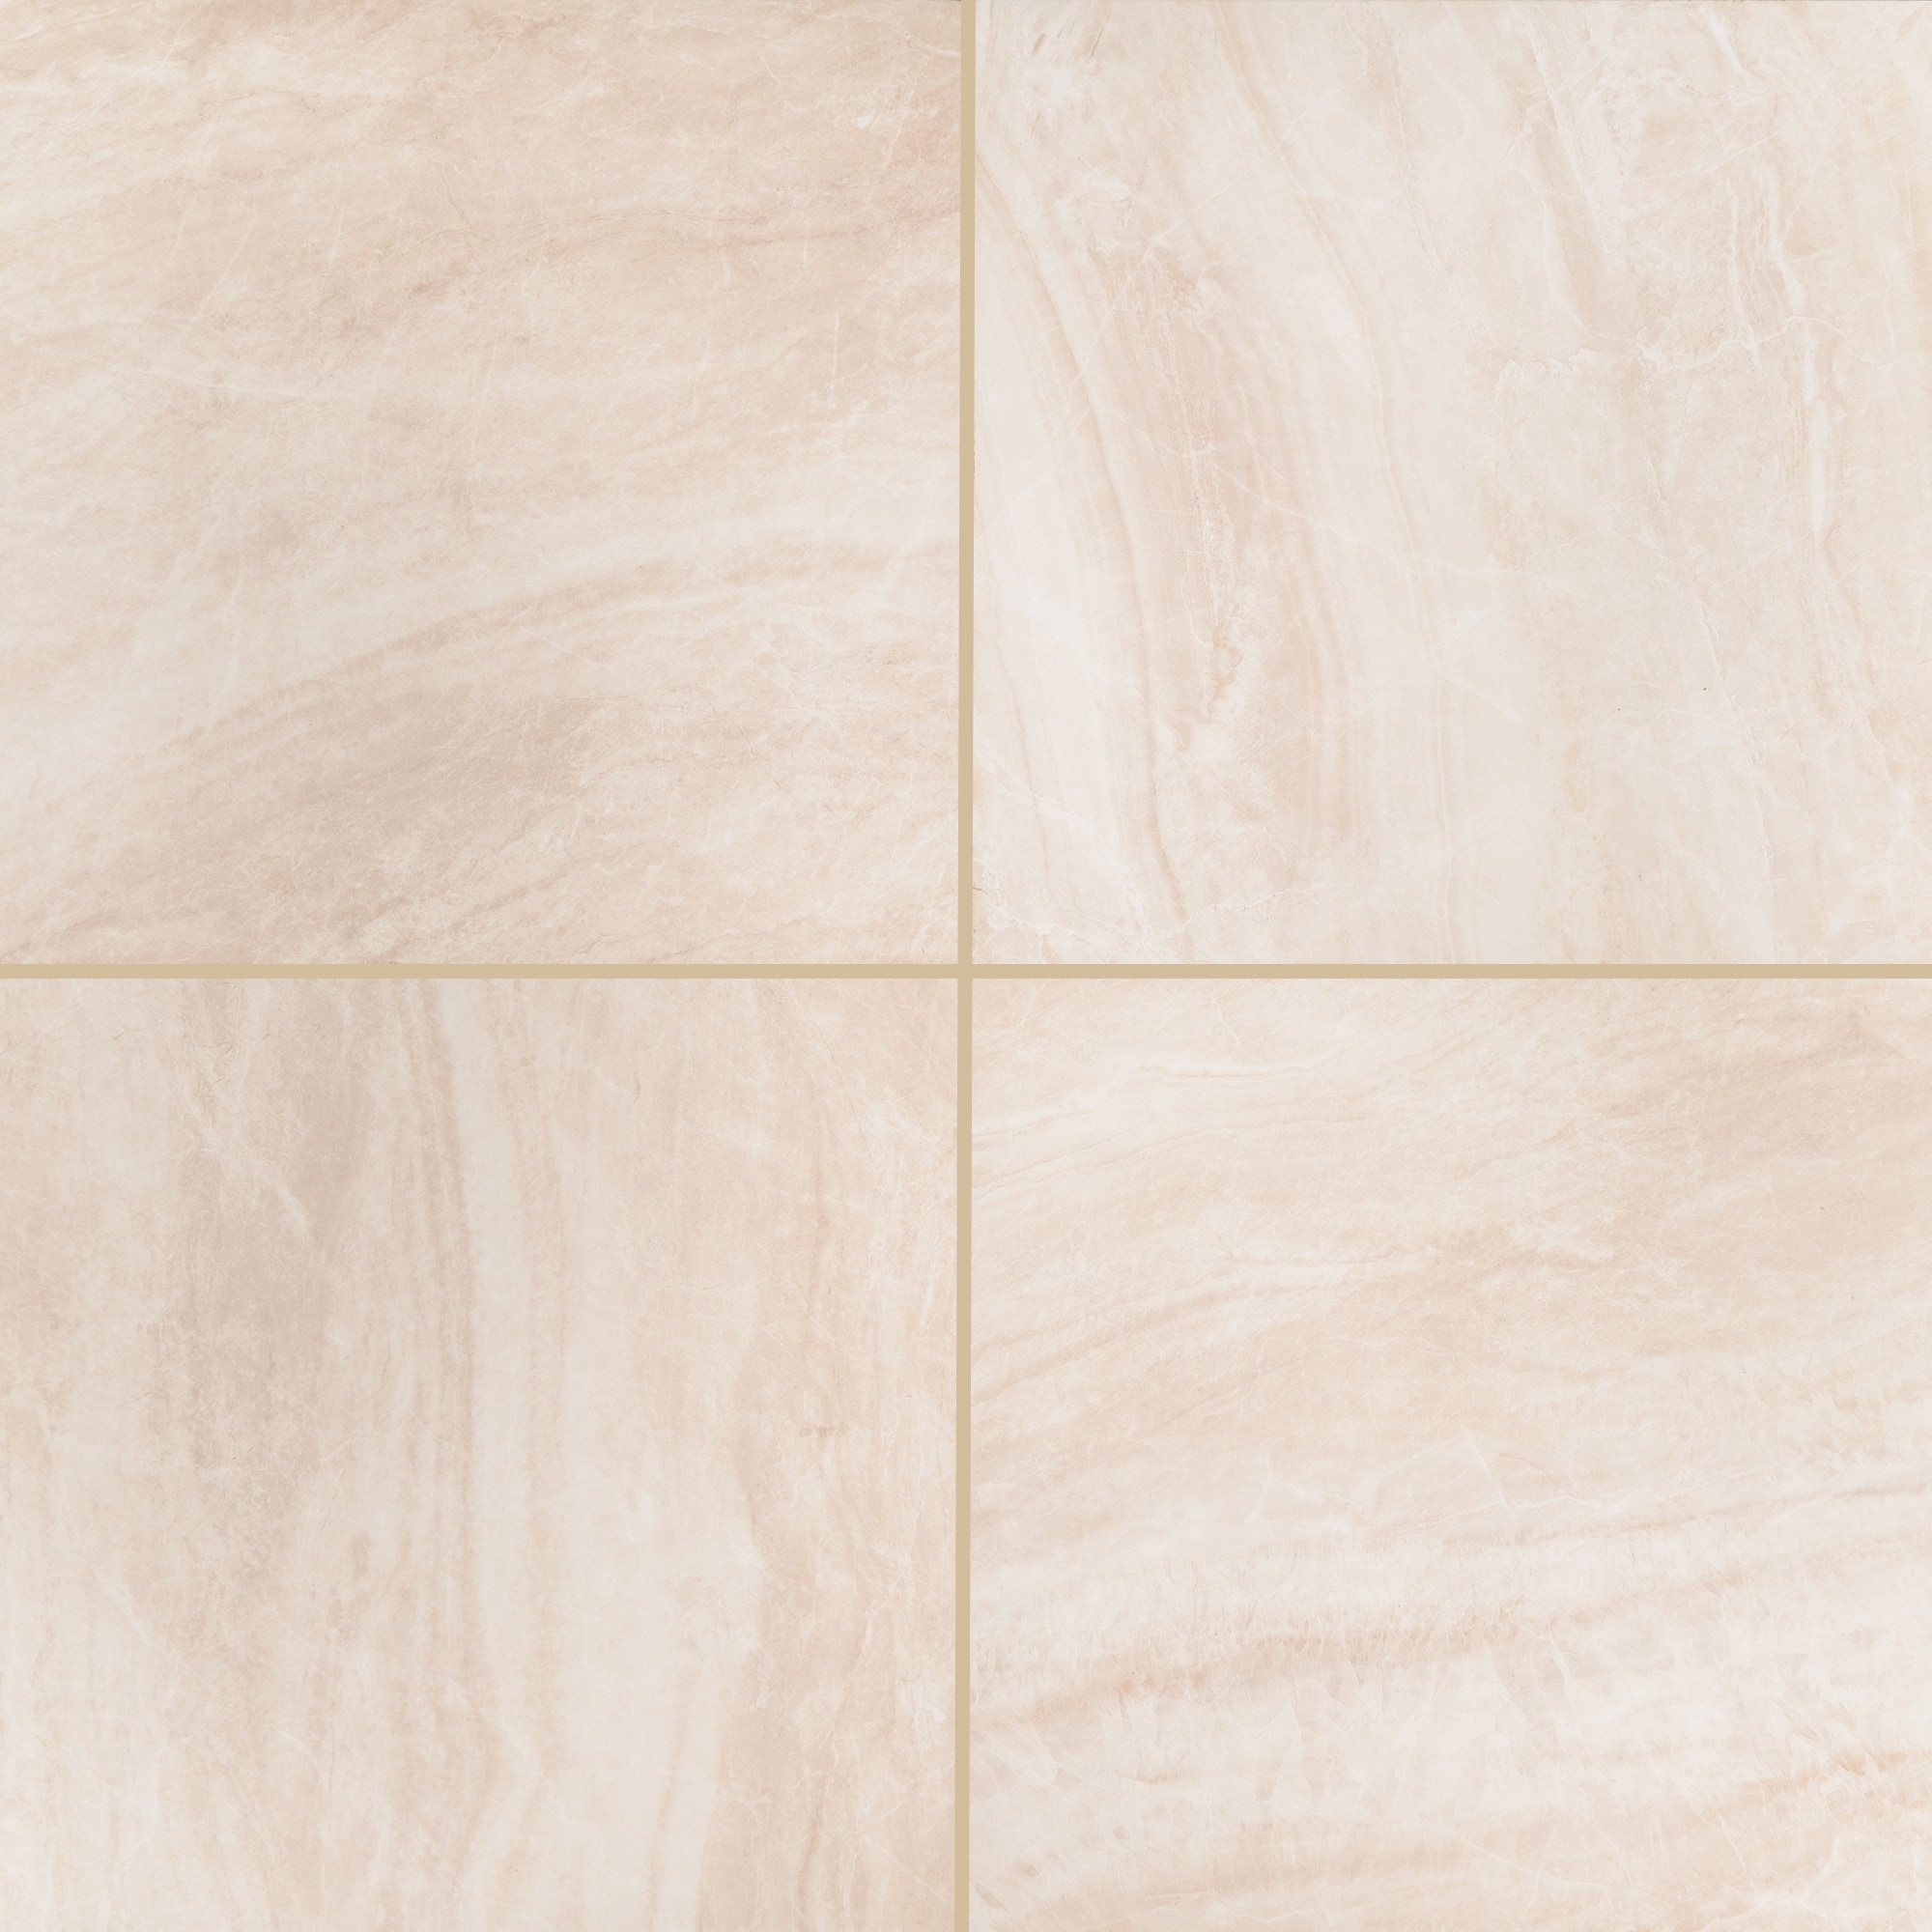 "Carrara / 24""x24"" / Matte Porcelain Tile Pavers - Seaside Marble Series 0"